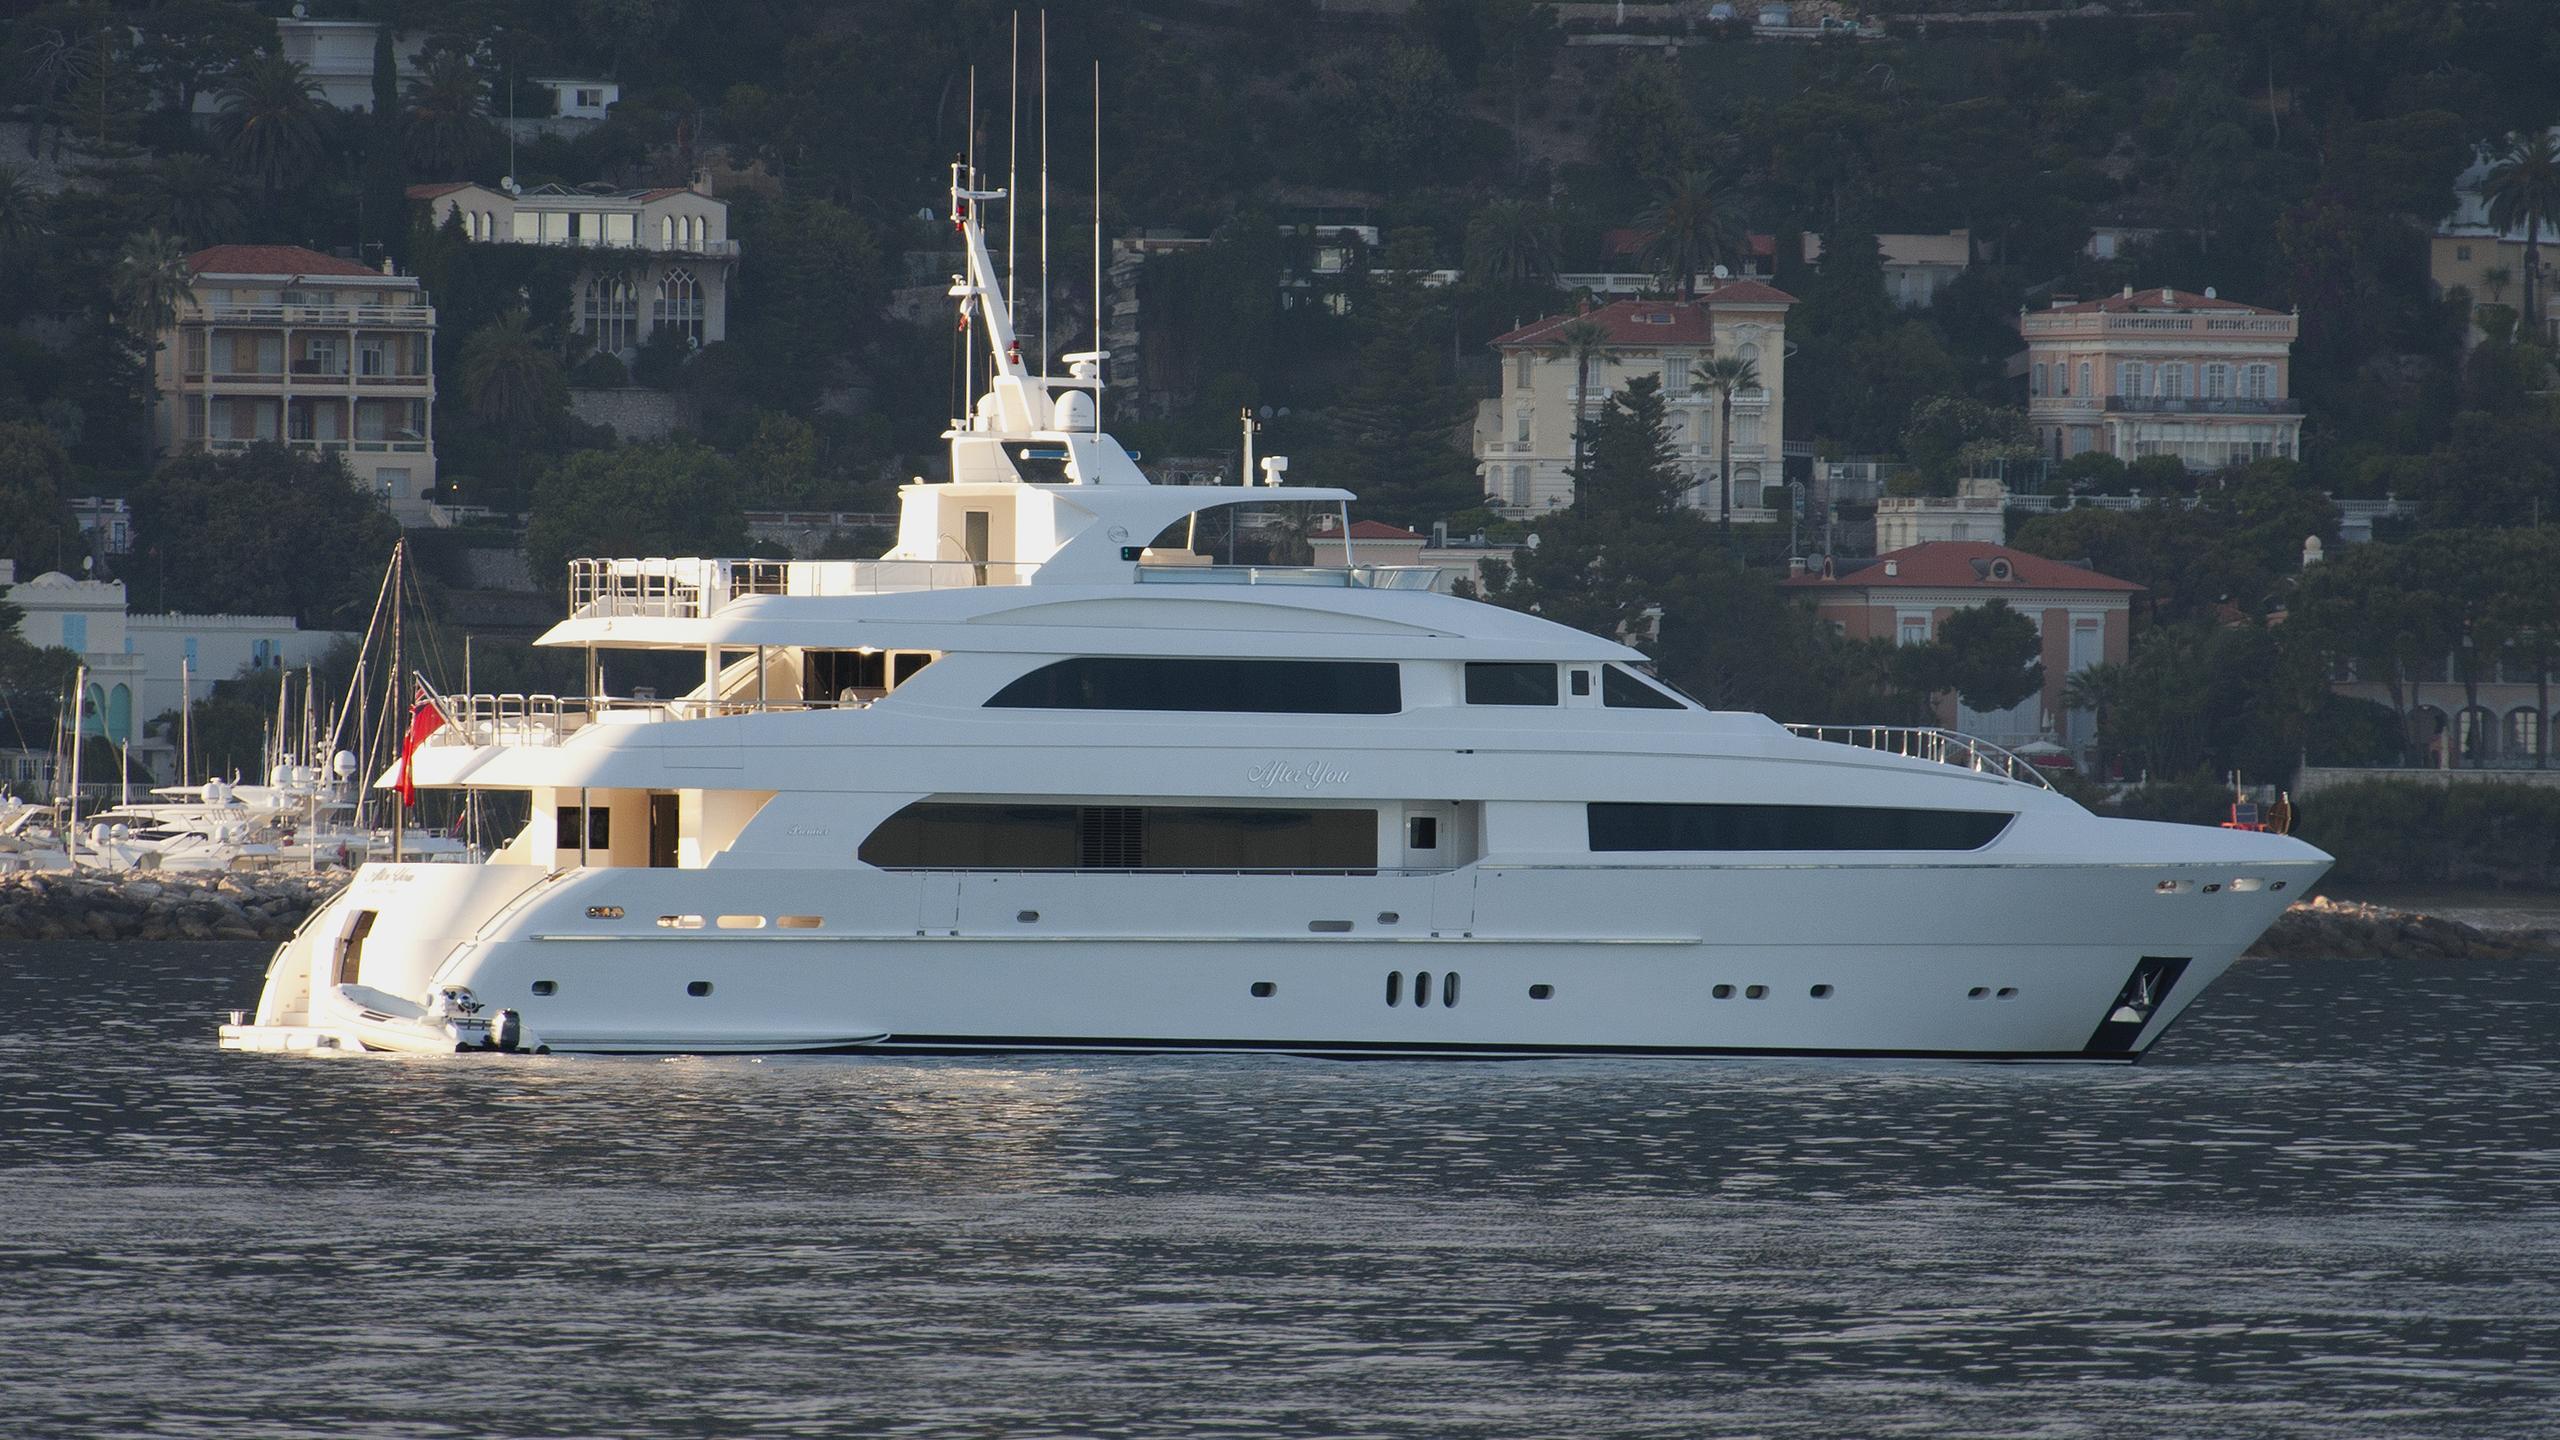 heritage karianna after you motoryacht horizon 40m 2008 profile